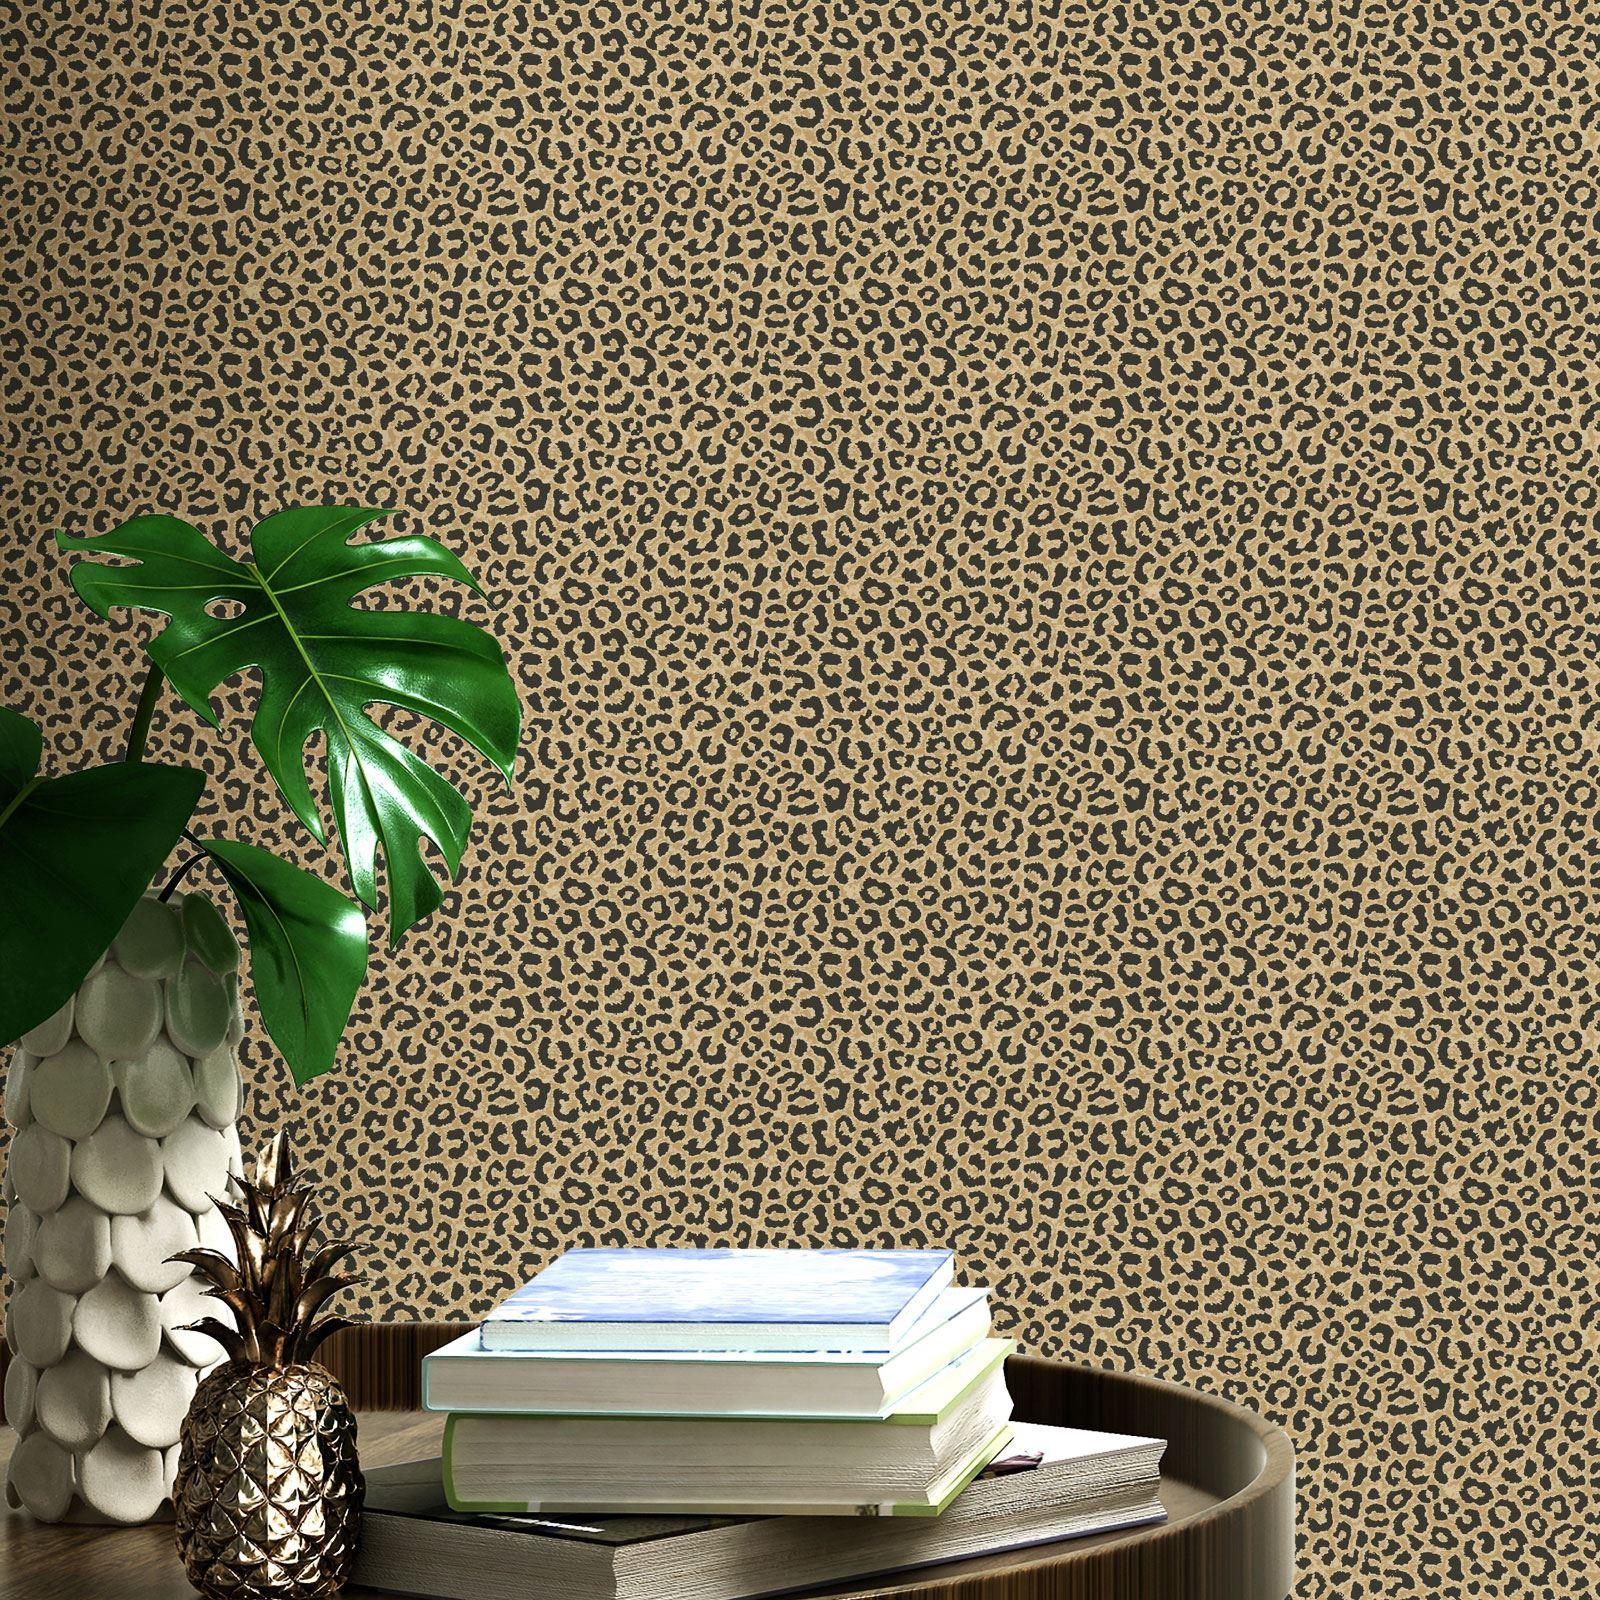 Limited 215311 Rasch 215311-Papel Pintado RASCH Color Negro y Dorado U.K dise/ño de Leopardo 10 m